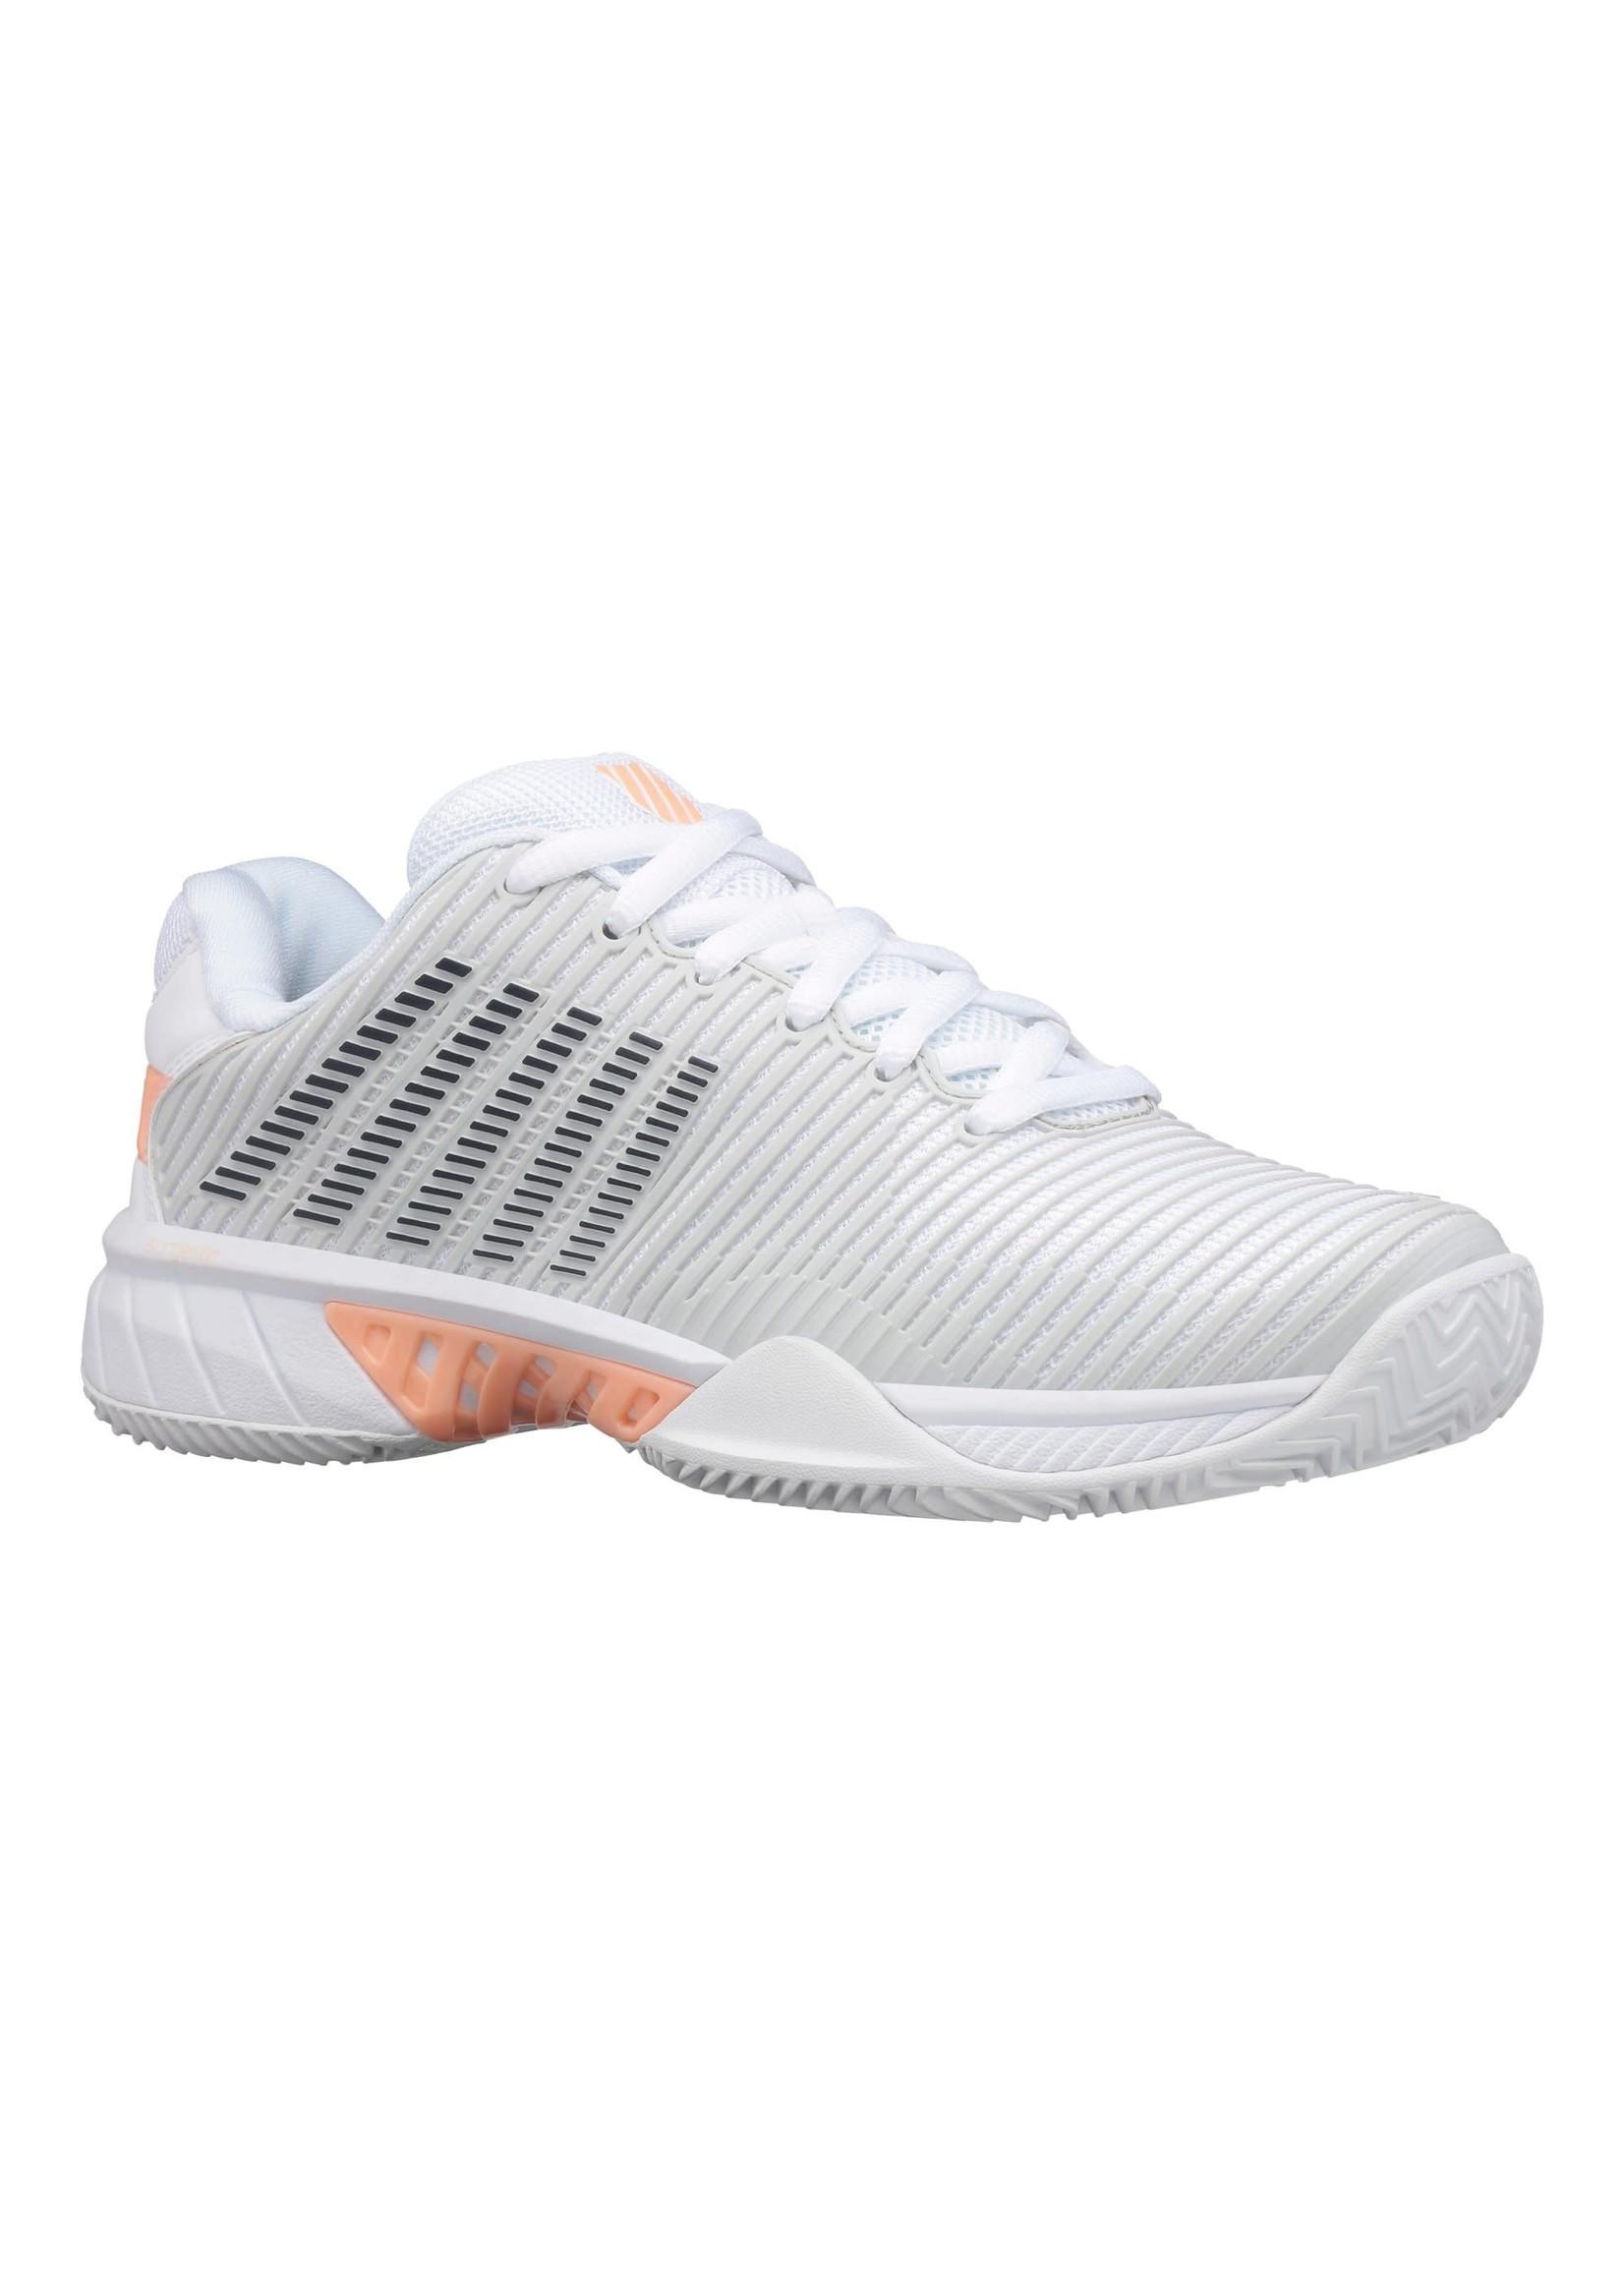 K Swiss K Swiss Express Light 2 Ladies Tennis Shoe (2021)